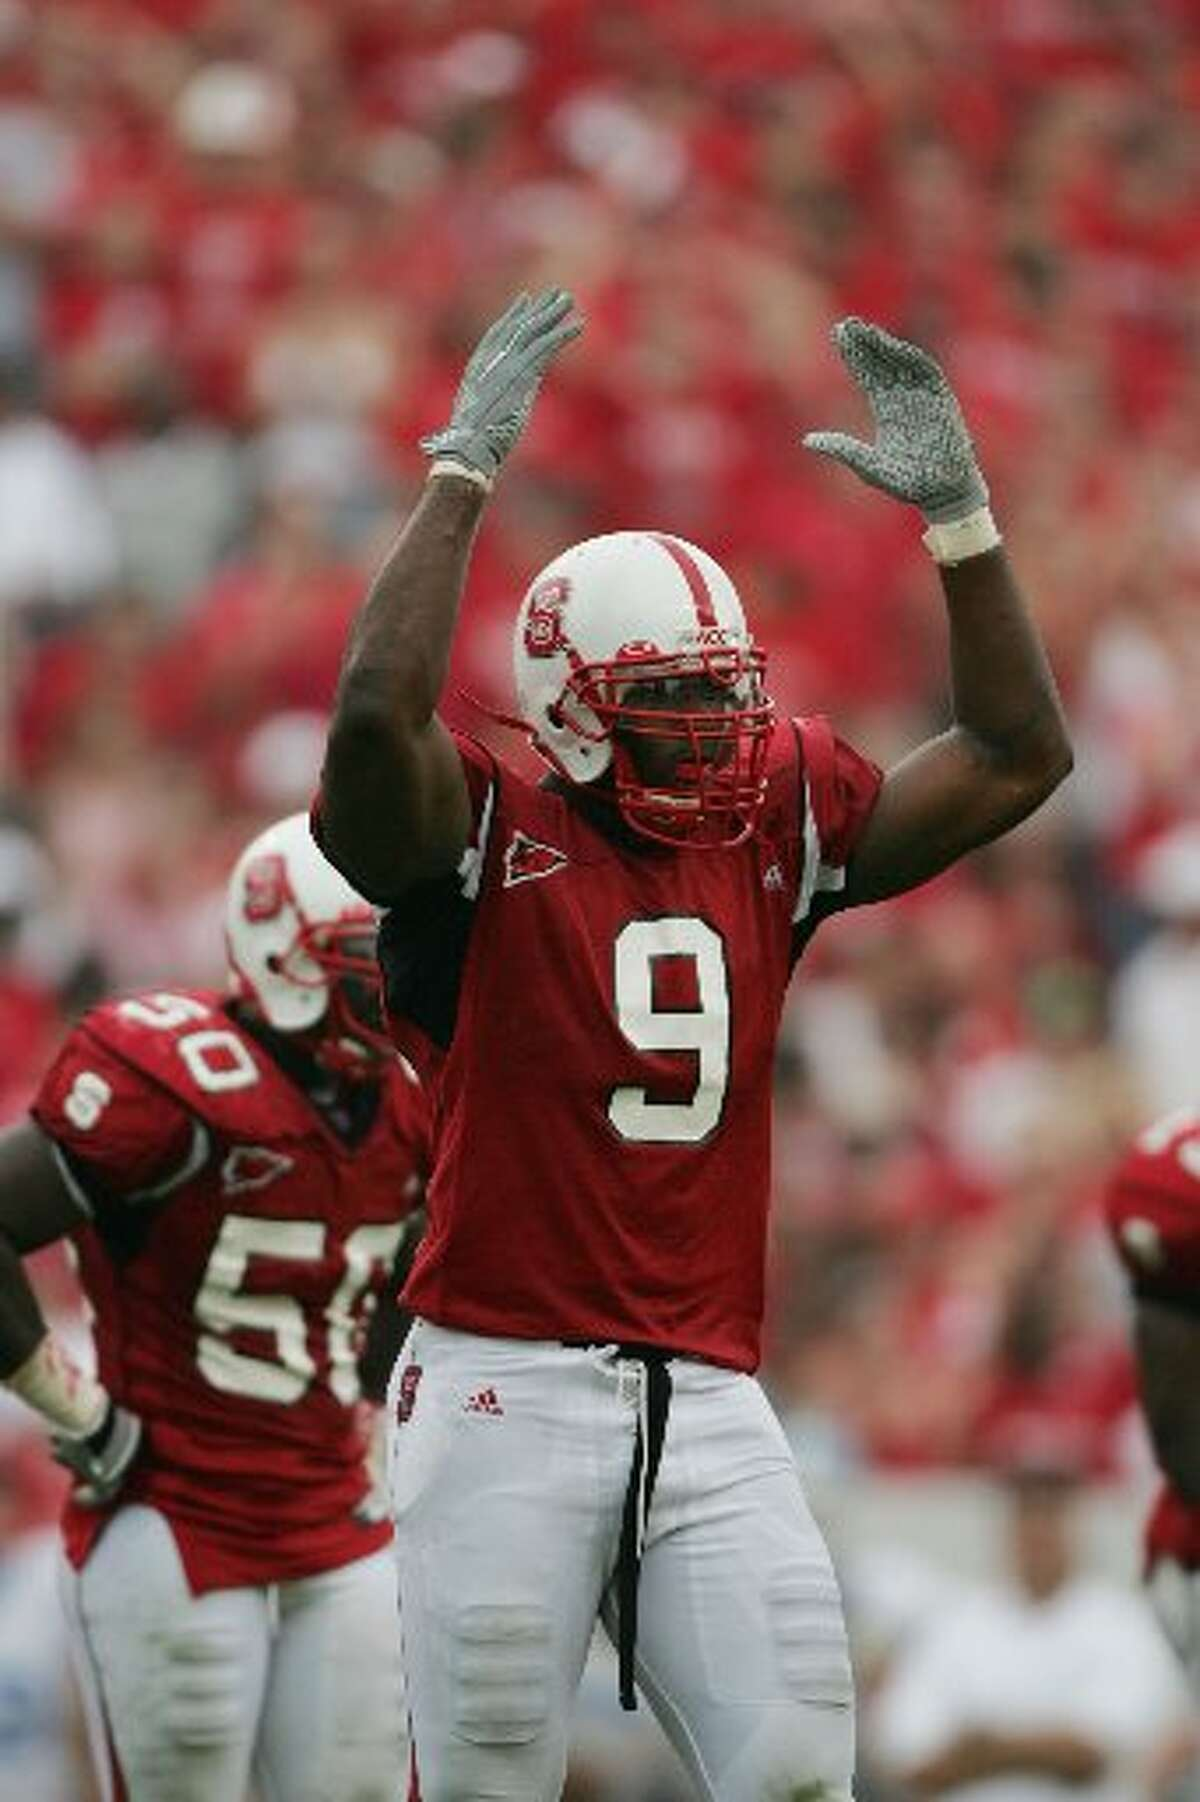 Mario Williams played college football at North Carolina State University.